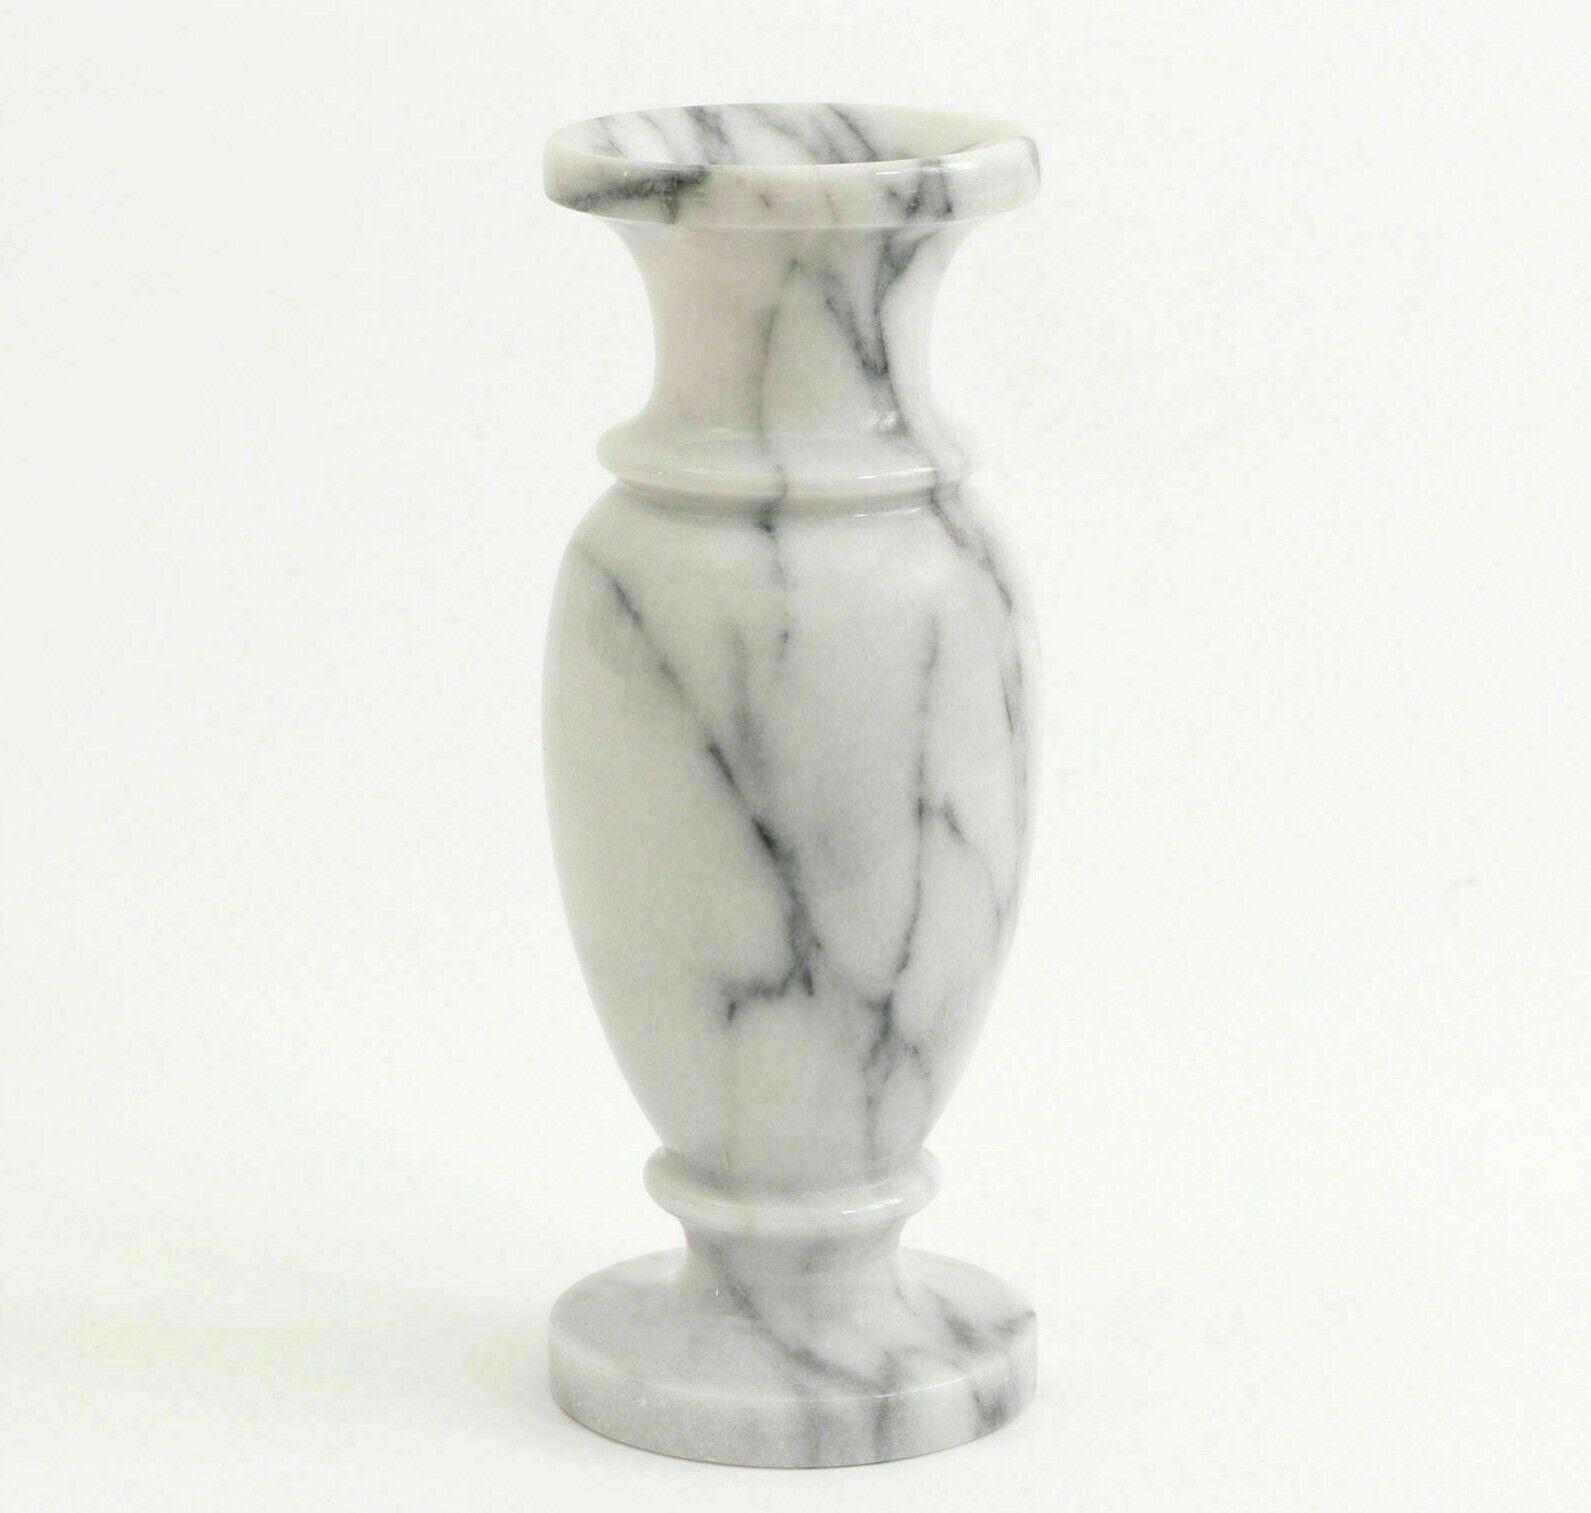 VASO Portafiori in Marmo Bianco blanco Marble Italian Flowers Vase Home H.33cm